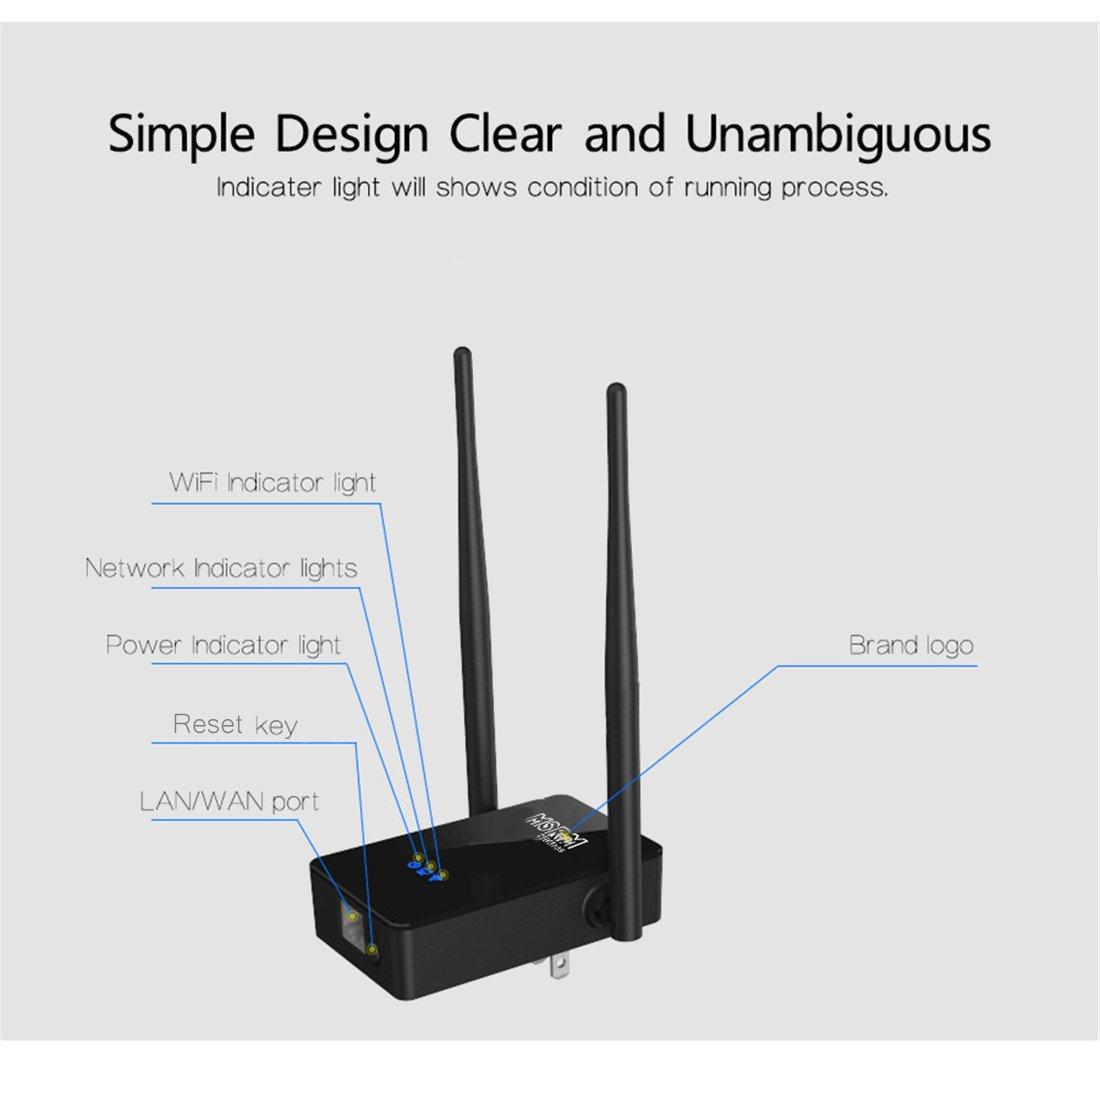 MSRM US750 750Mbps Long WiFi Range Extender 360 Degree Full Coverage High Power Dual Band Range Extender (Black) by MSRMUS (Image #5)